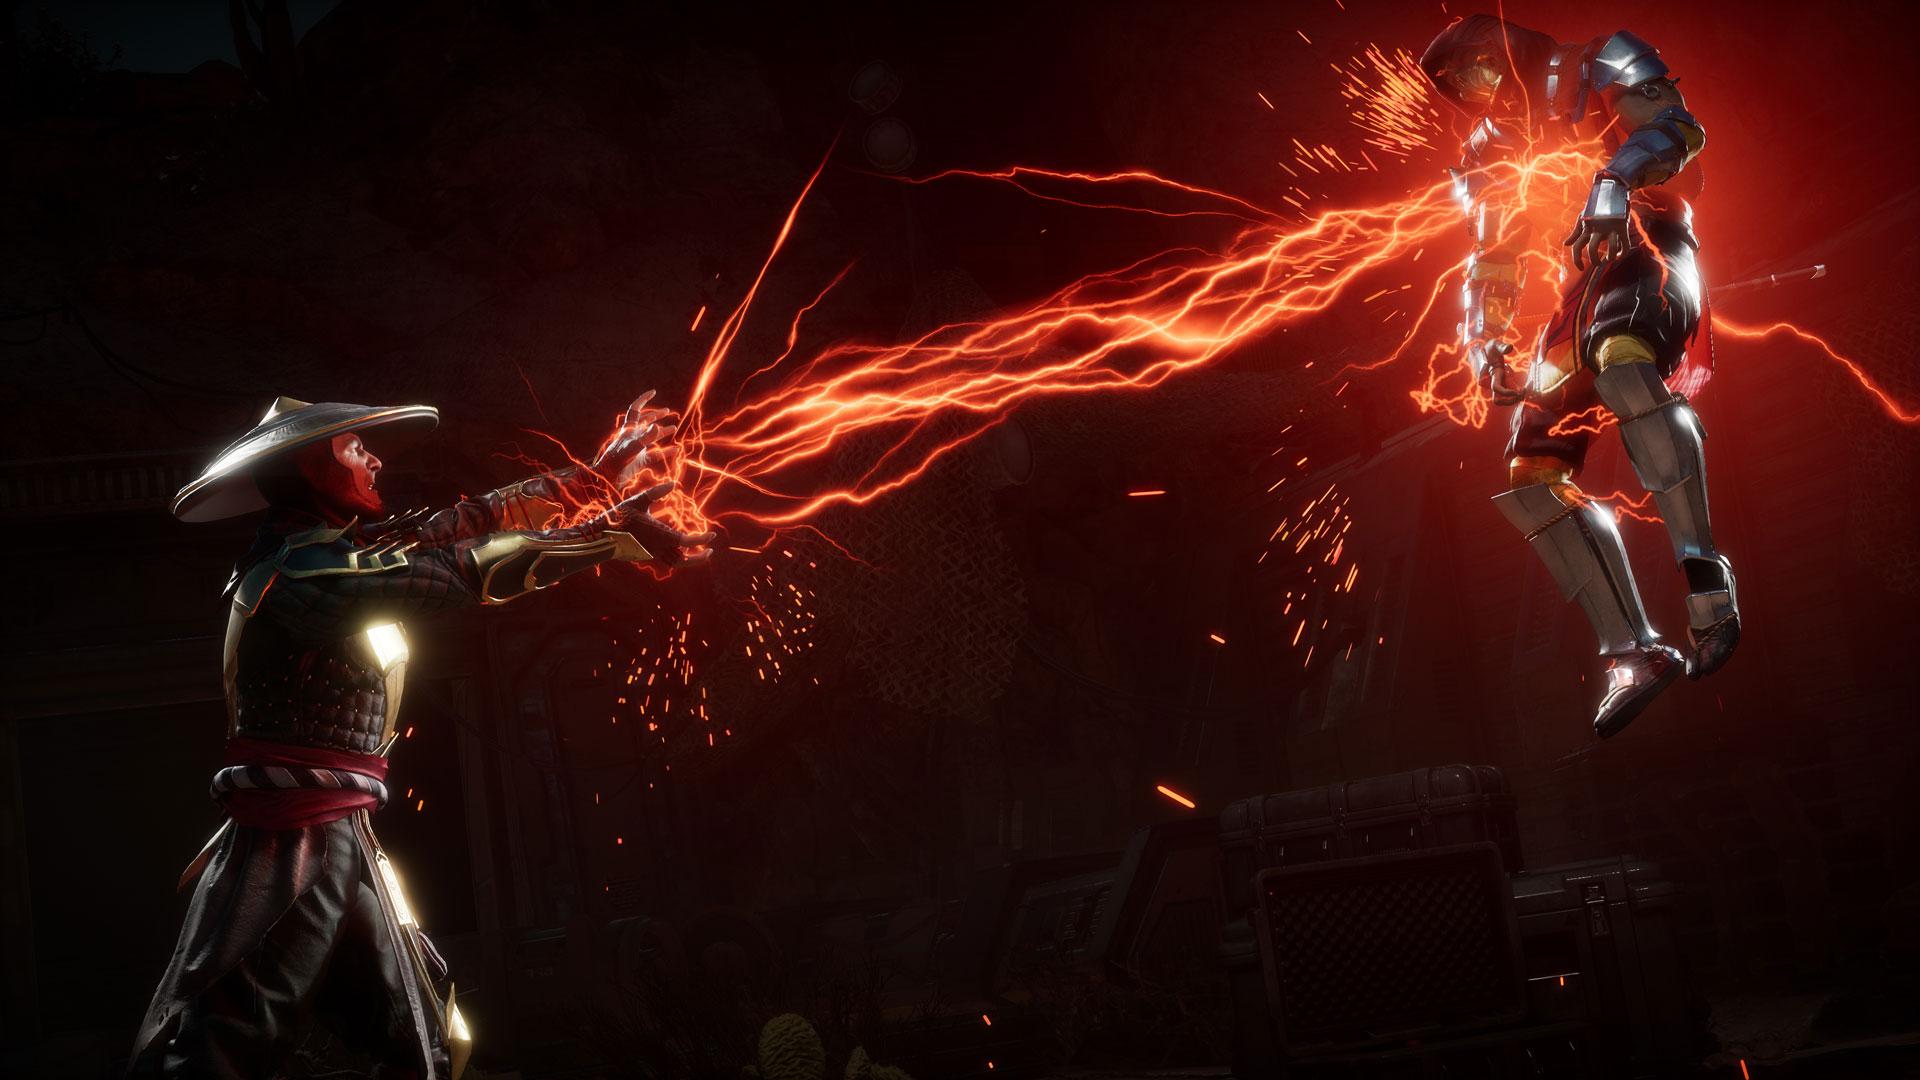 o71lwwep.jpg - Mortal Kombat 11